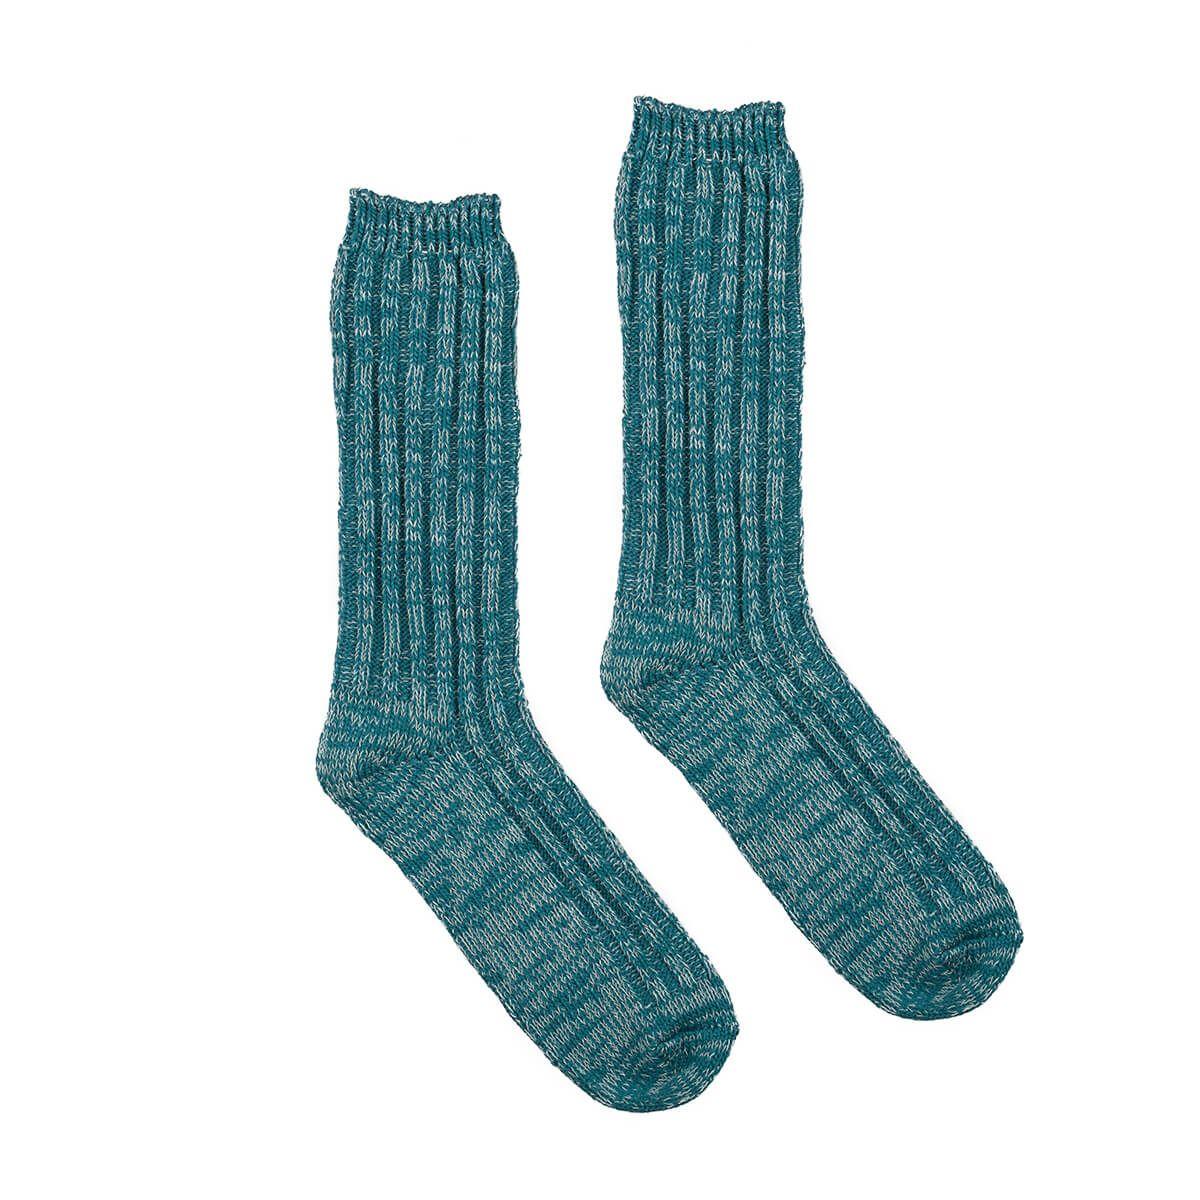 USED FUTURE Mix Socks in Green